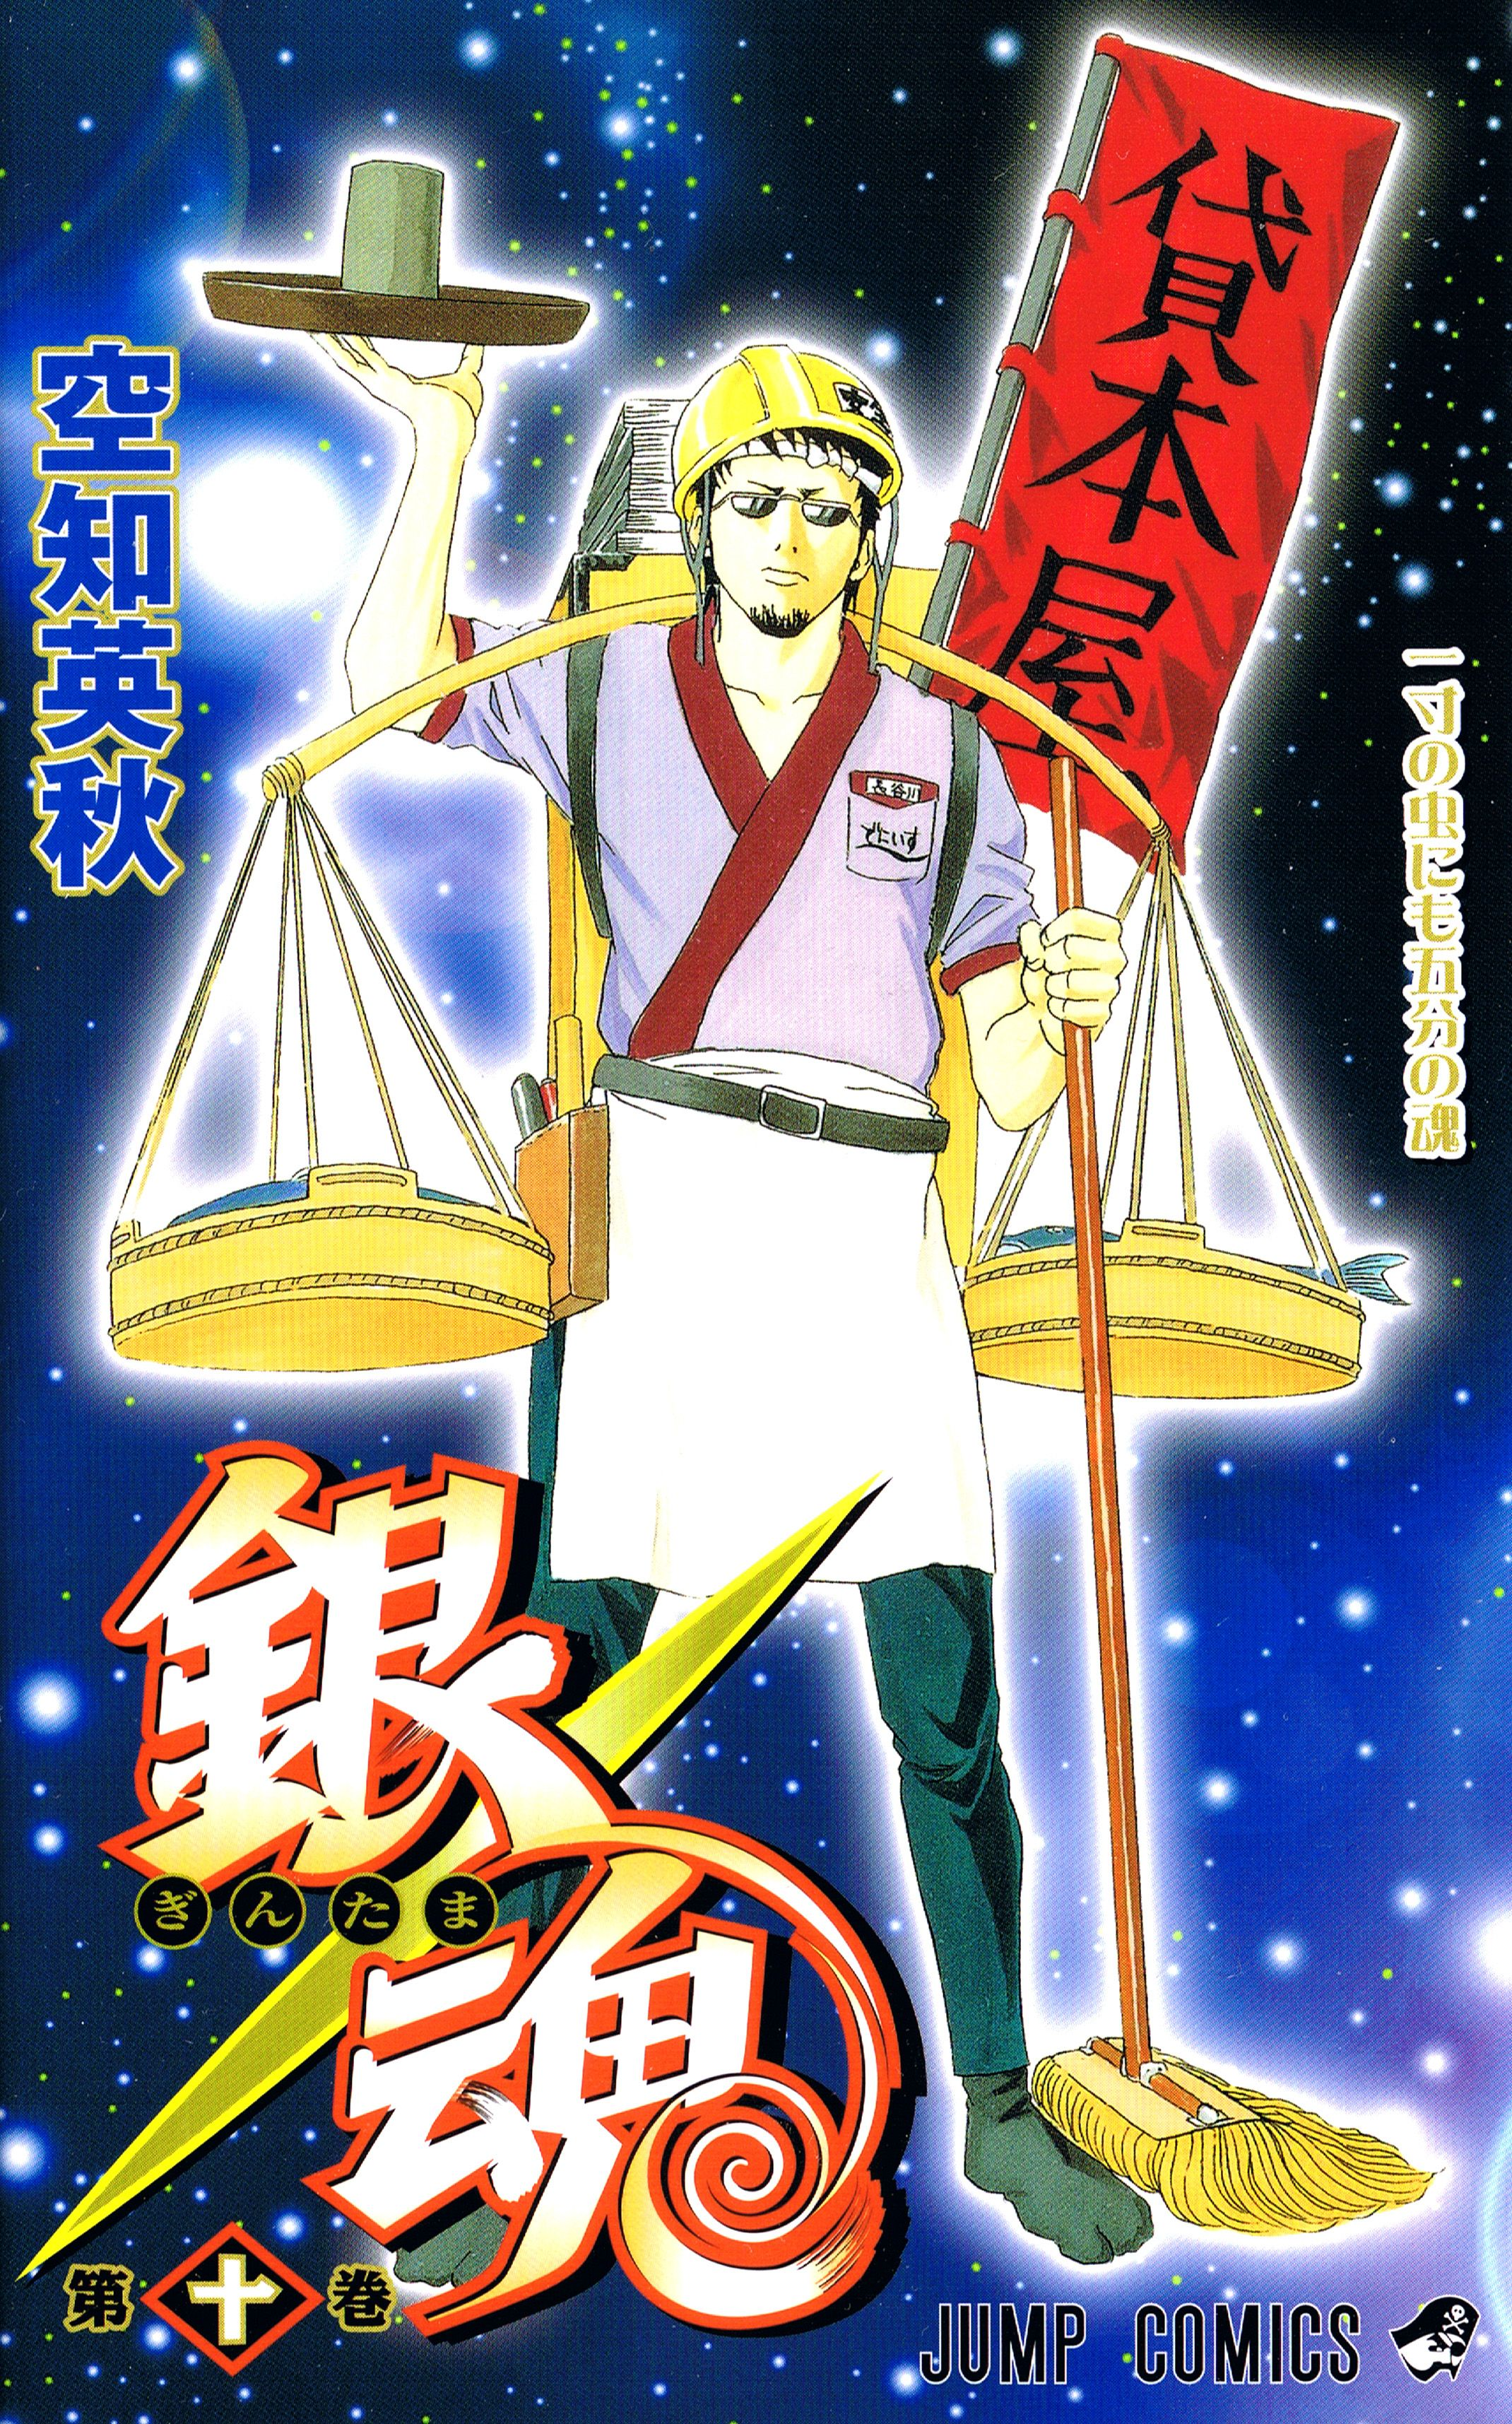 Hasegawa Taizou/1091910 Anime, Anime images, Gin tama